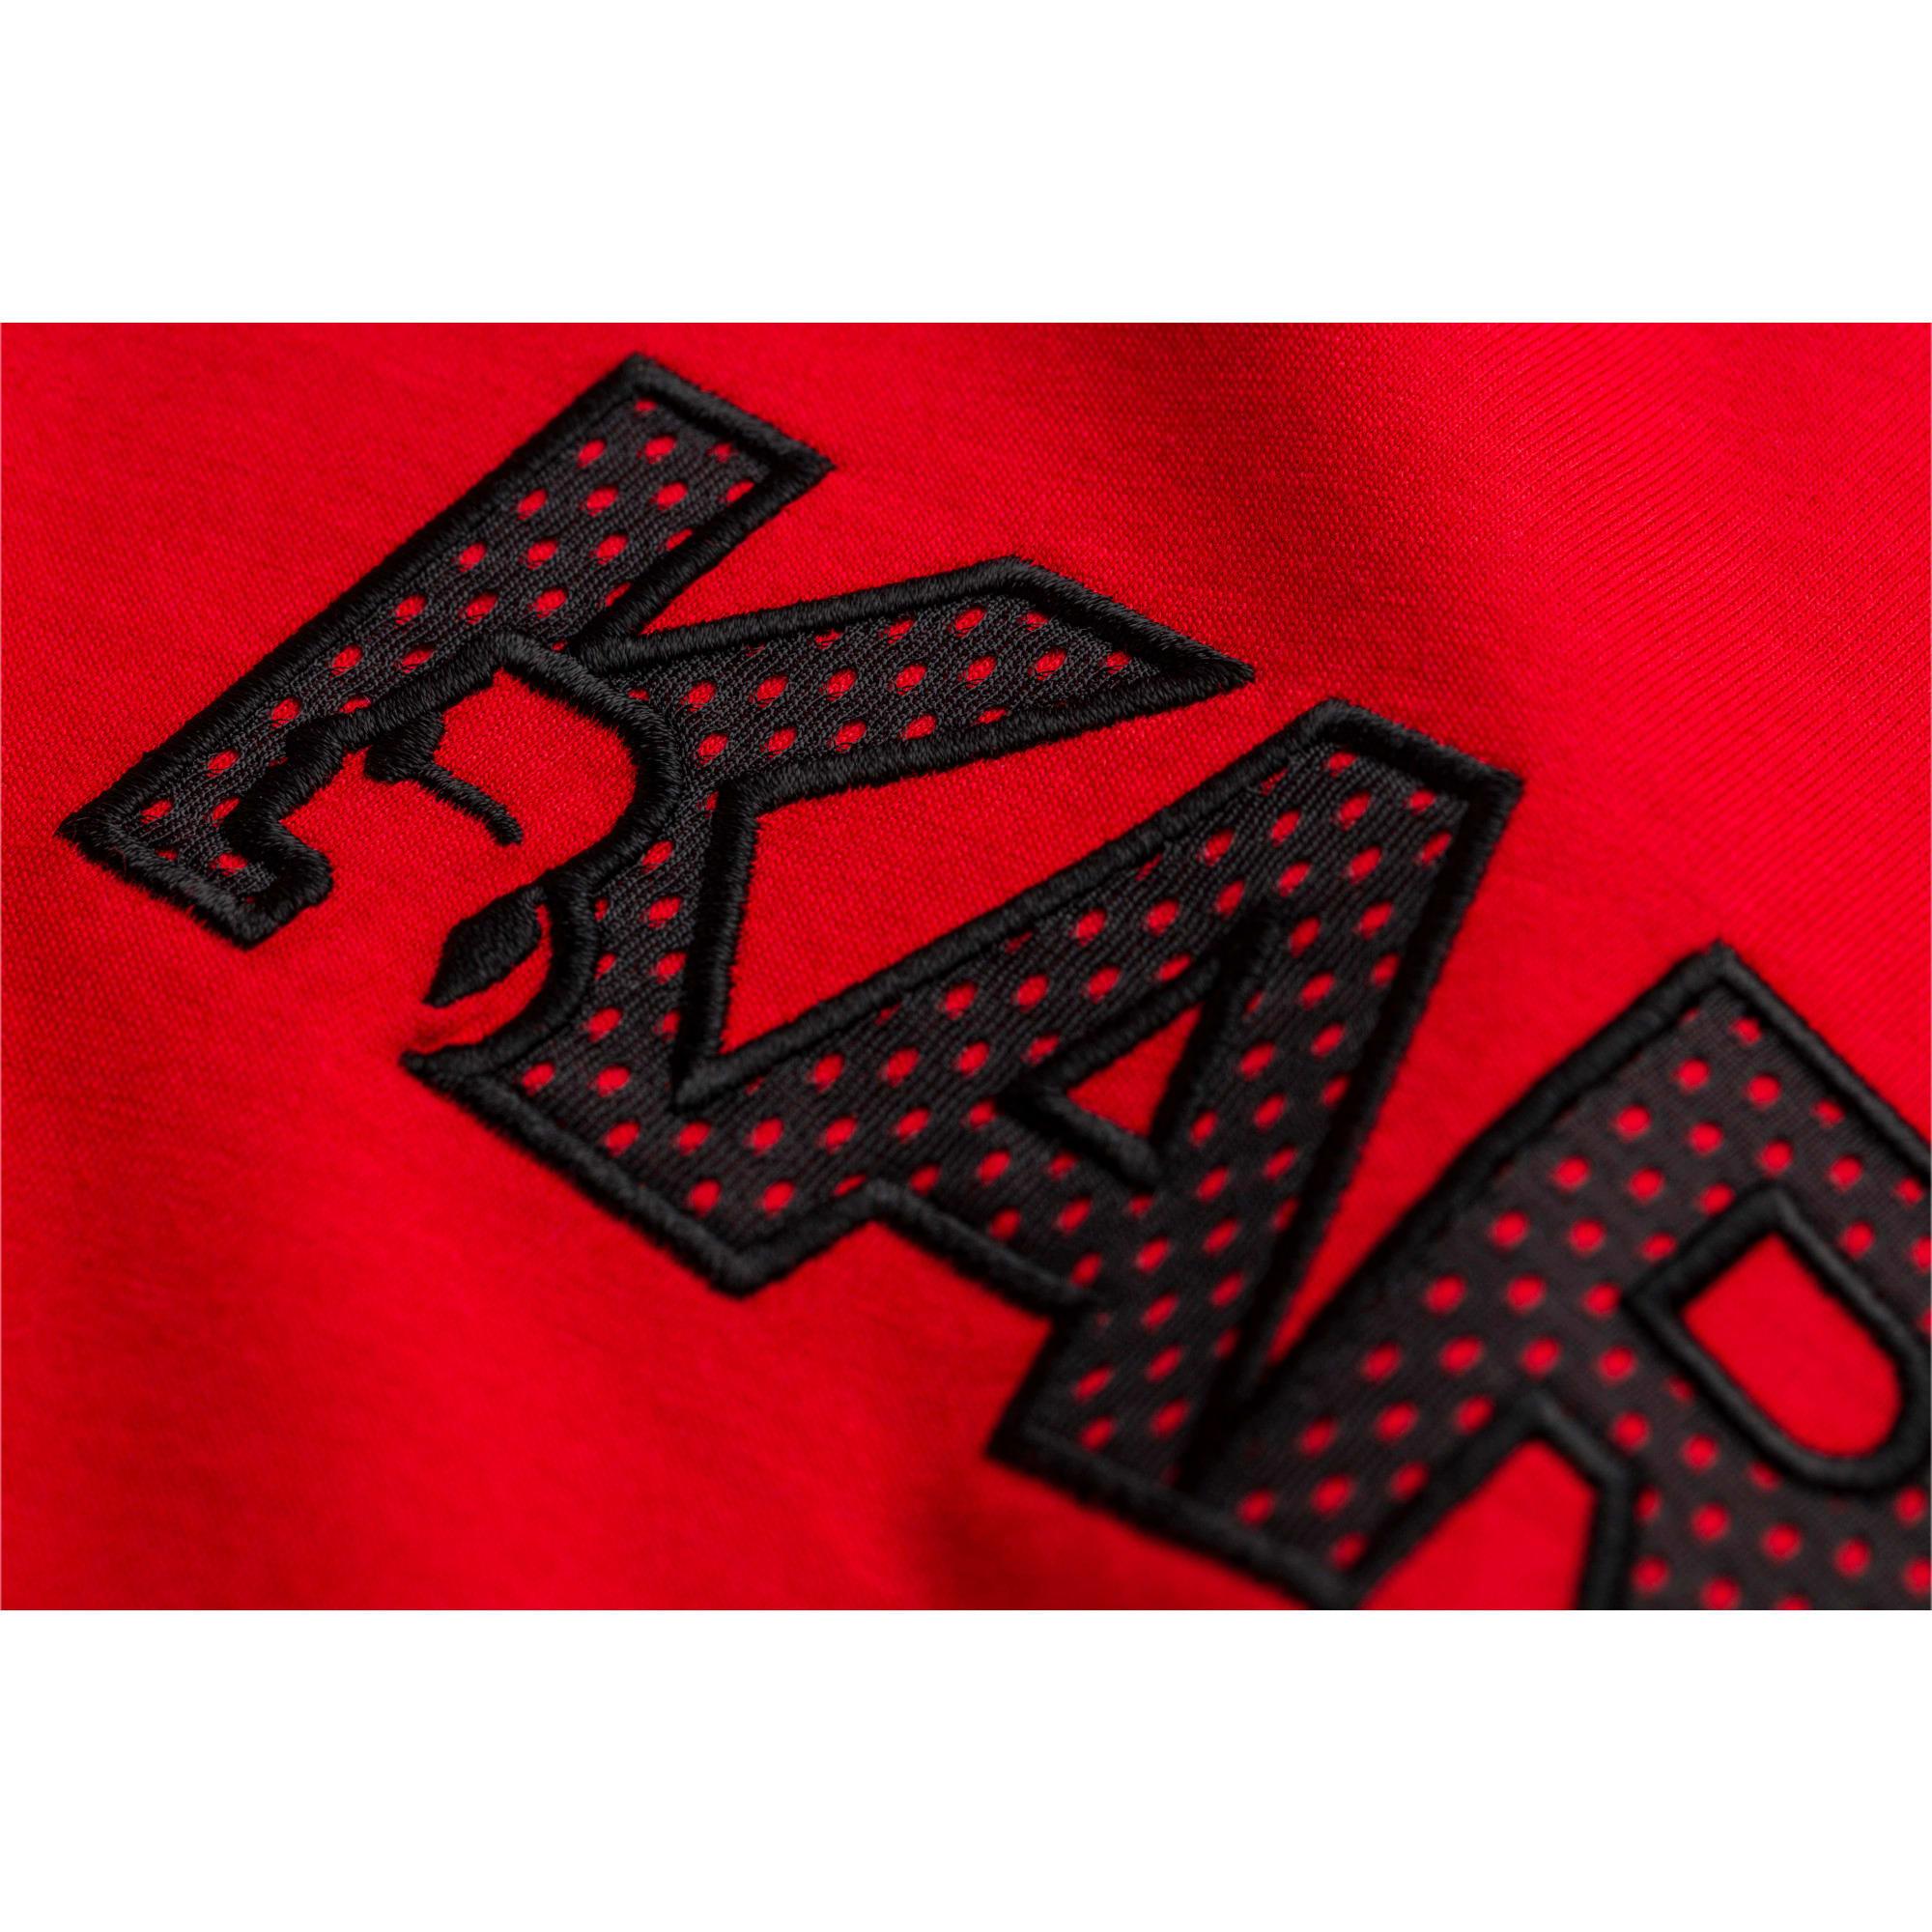 Thumbnail 3 of PUMA x KARL LAGERFELD Women's Tee, High Risk Red, medium